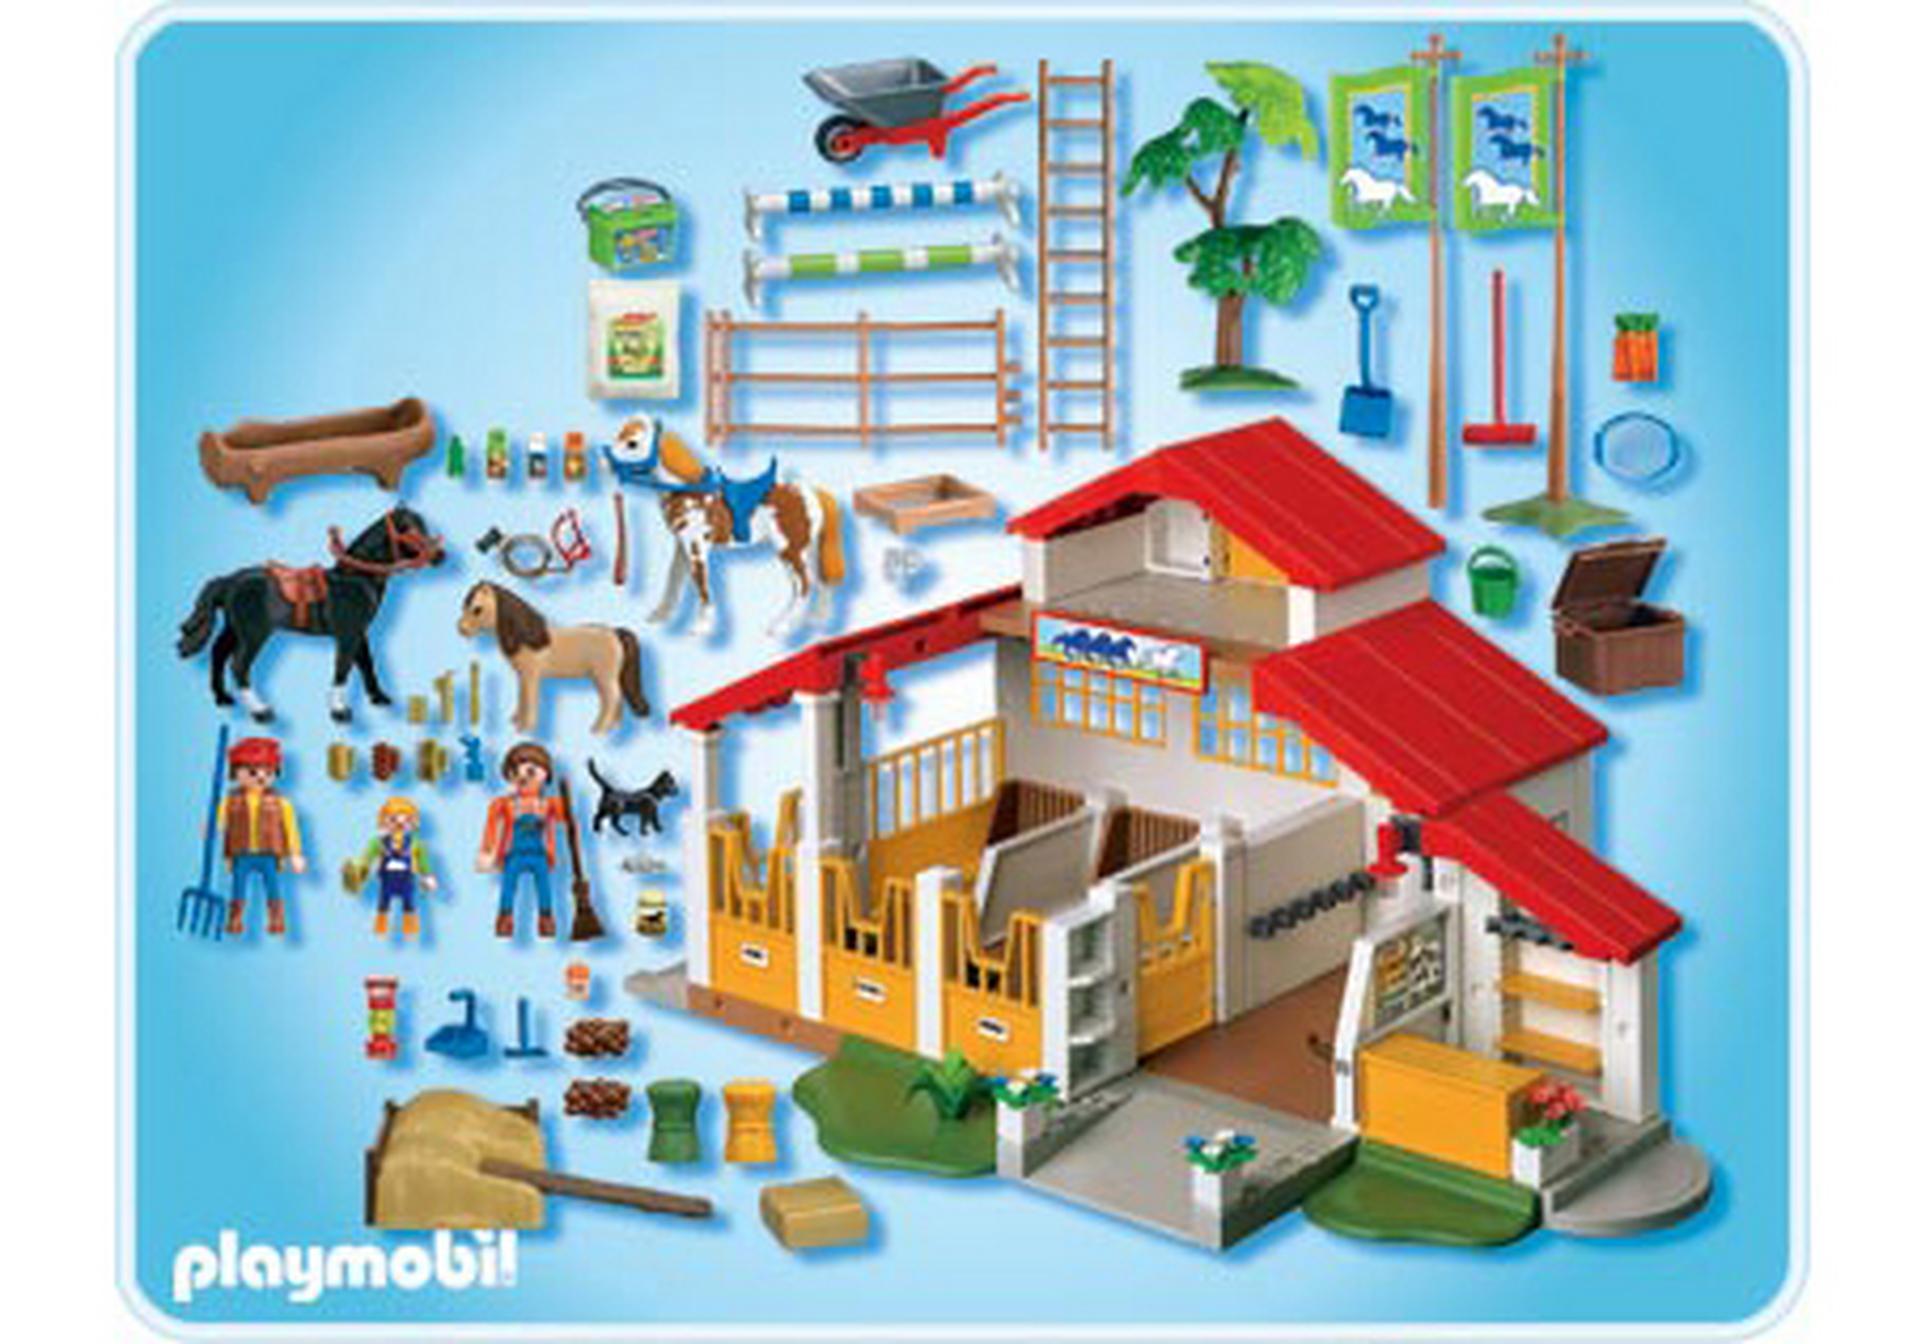 centre questre 4190 a playmobil france. Black Bedroom Furniture Sets. Home Design Ideas